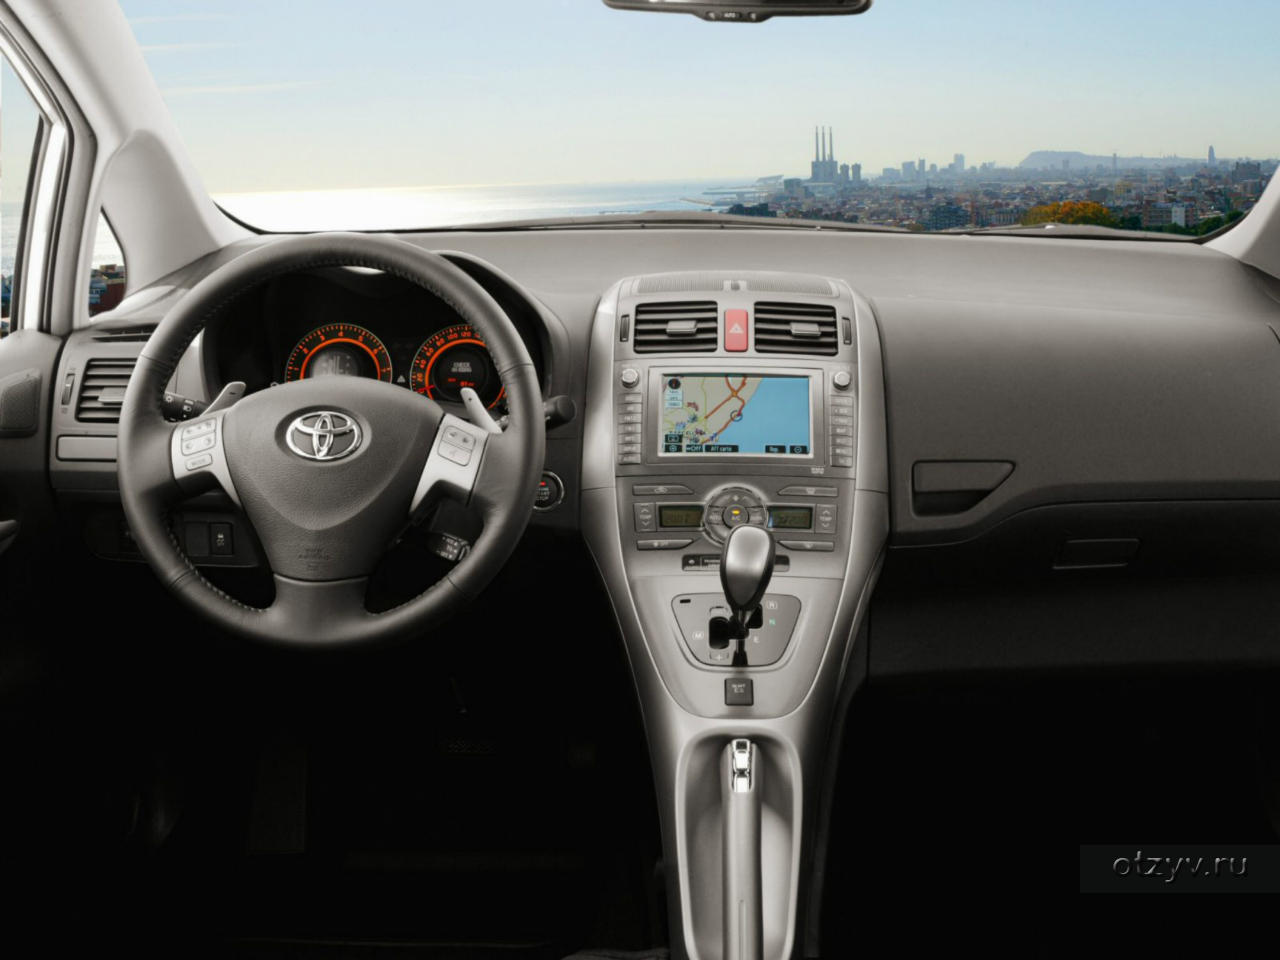 Toyota Аурис 1 6 технические характеристики